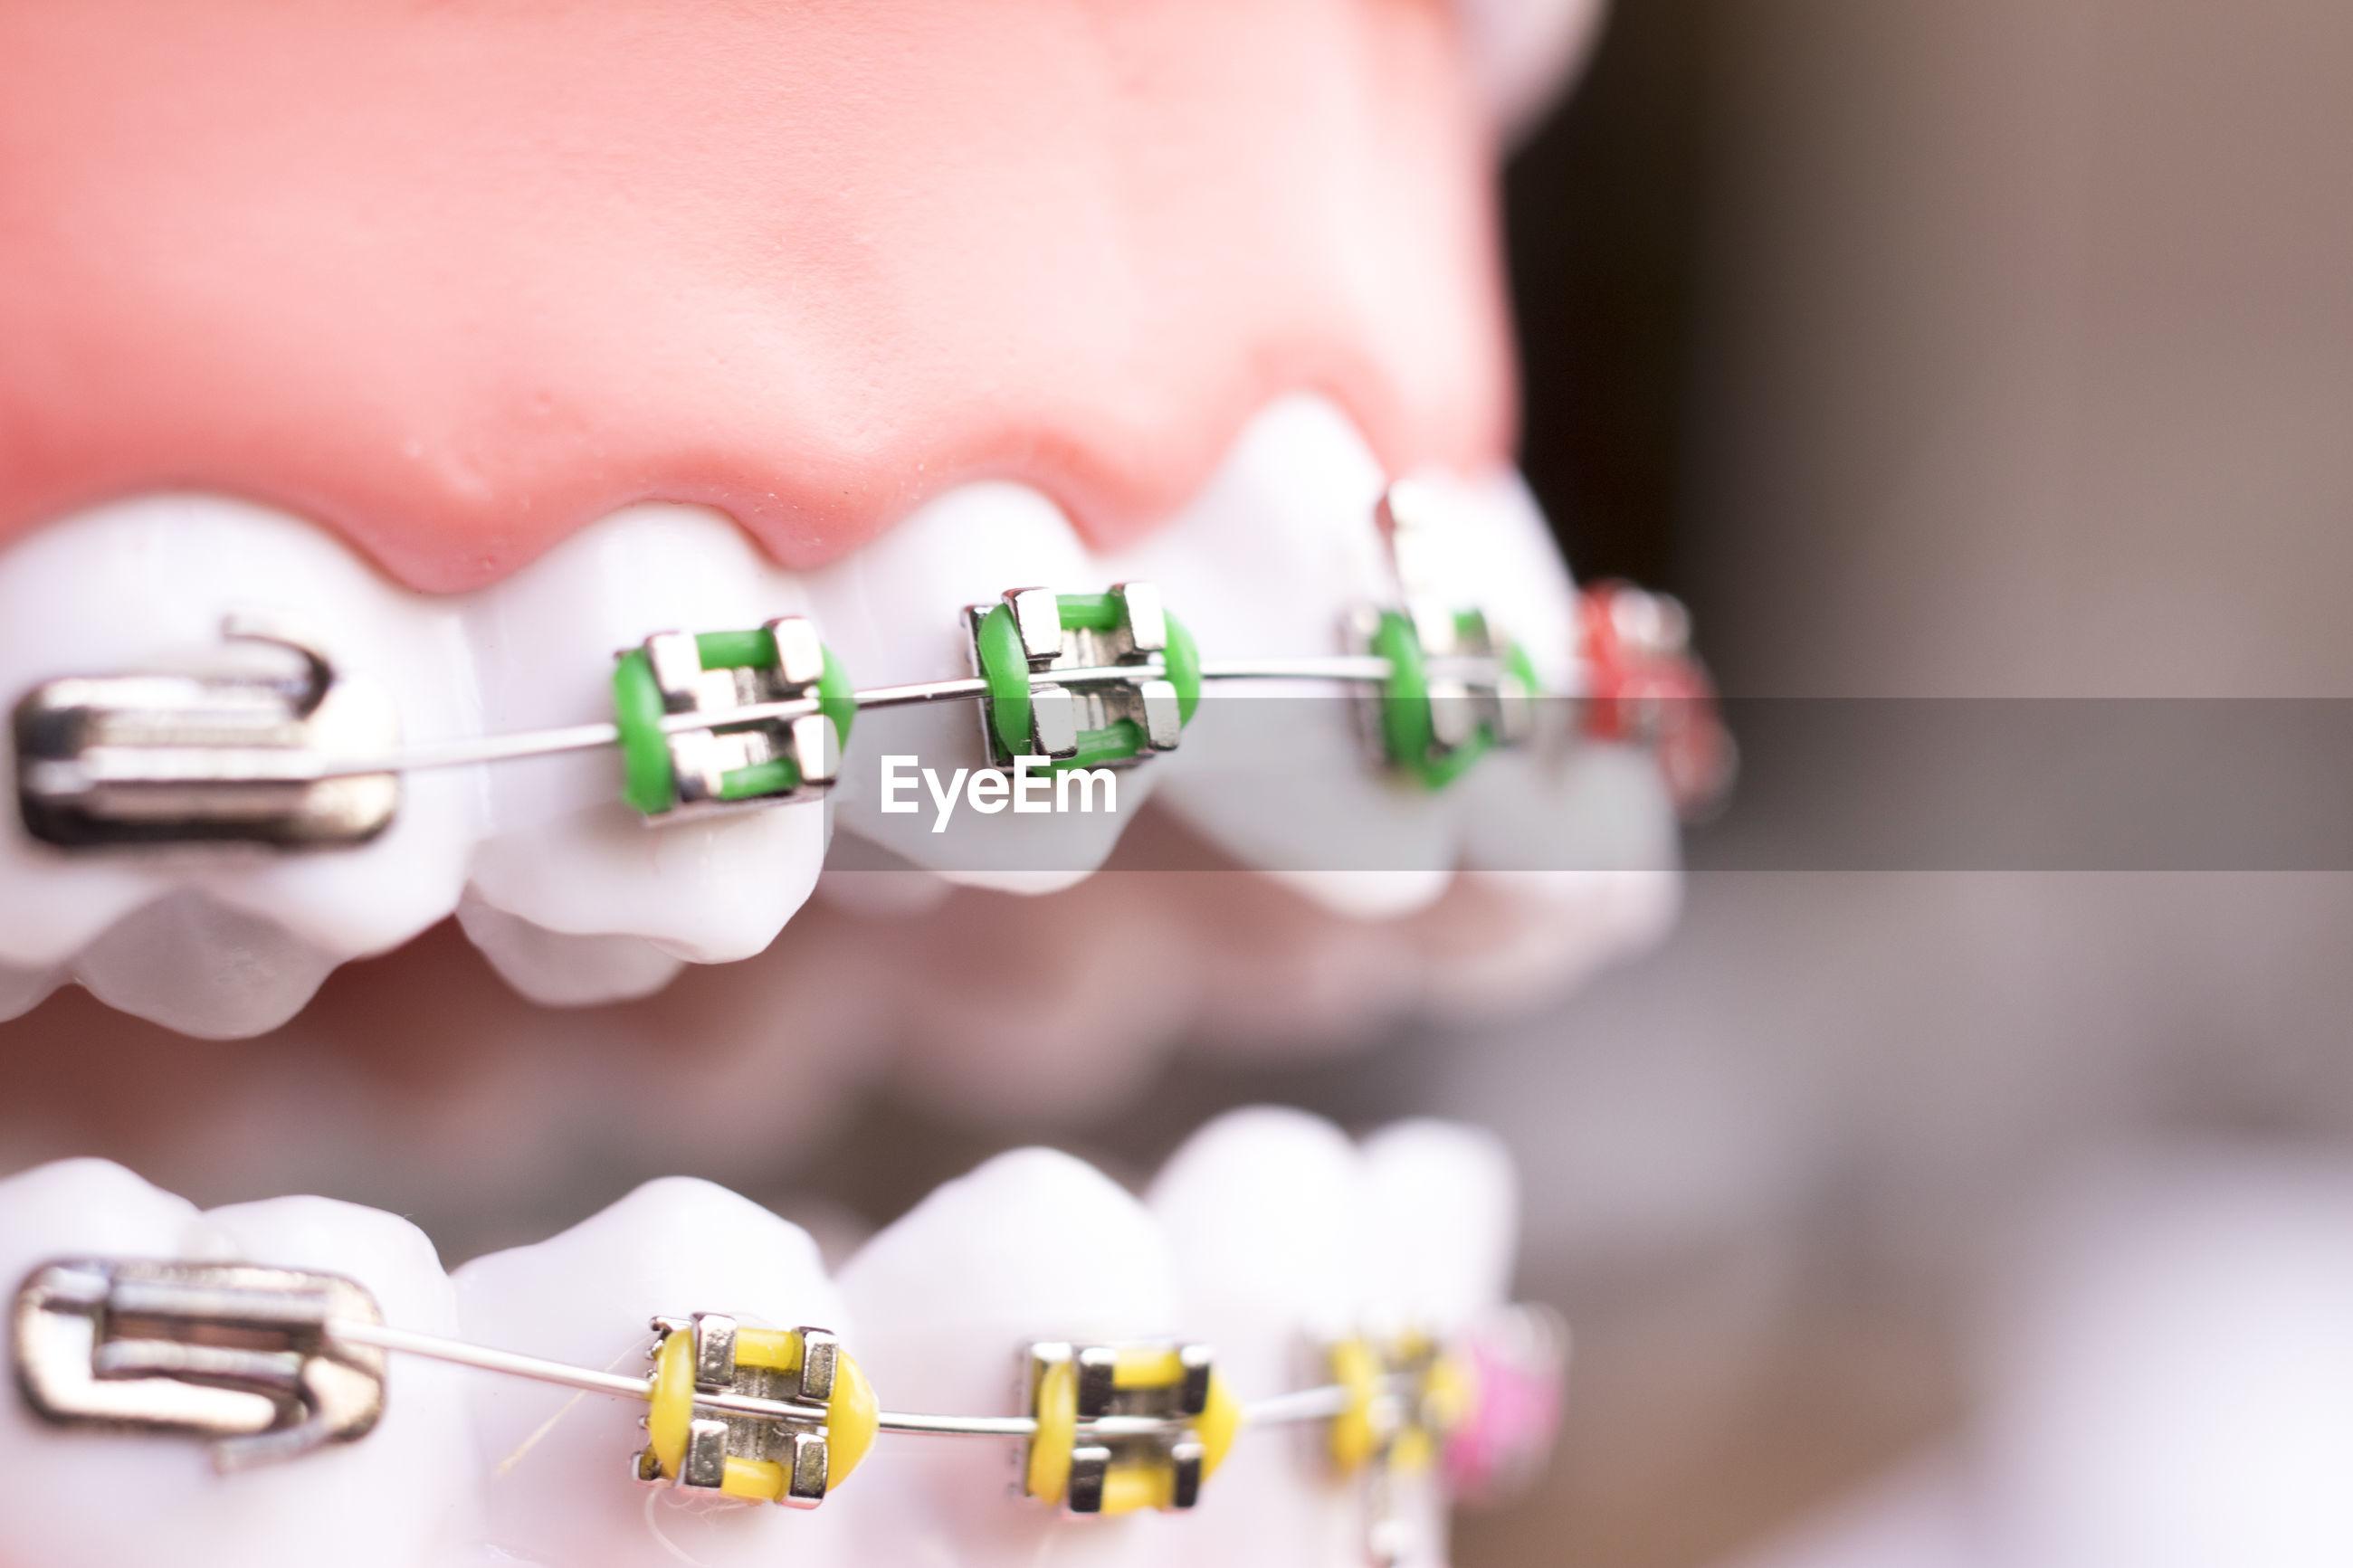 Close-up of braces dentures